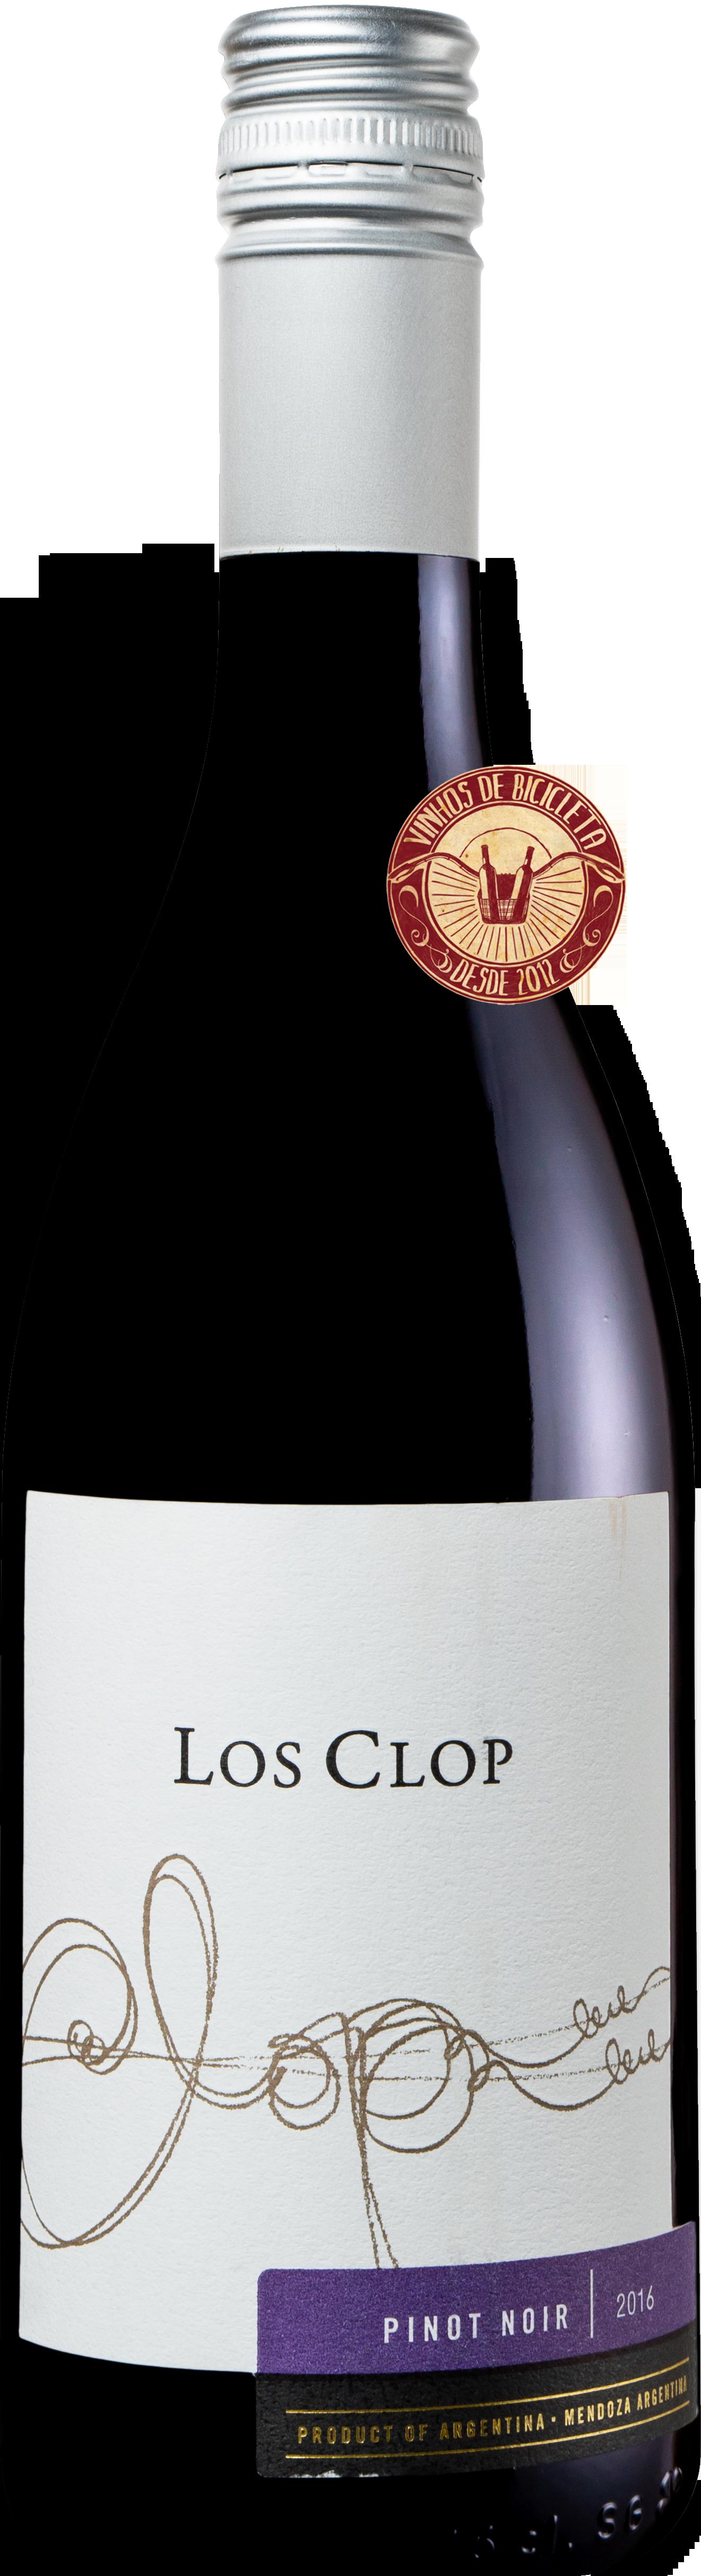 Los Clop Pinot Noir